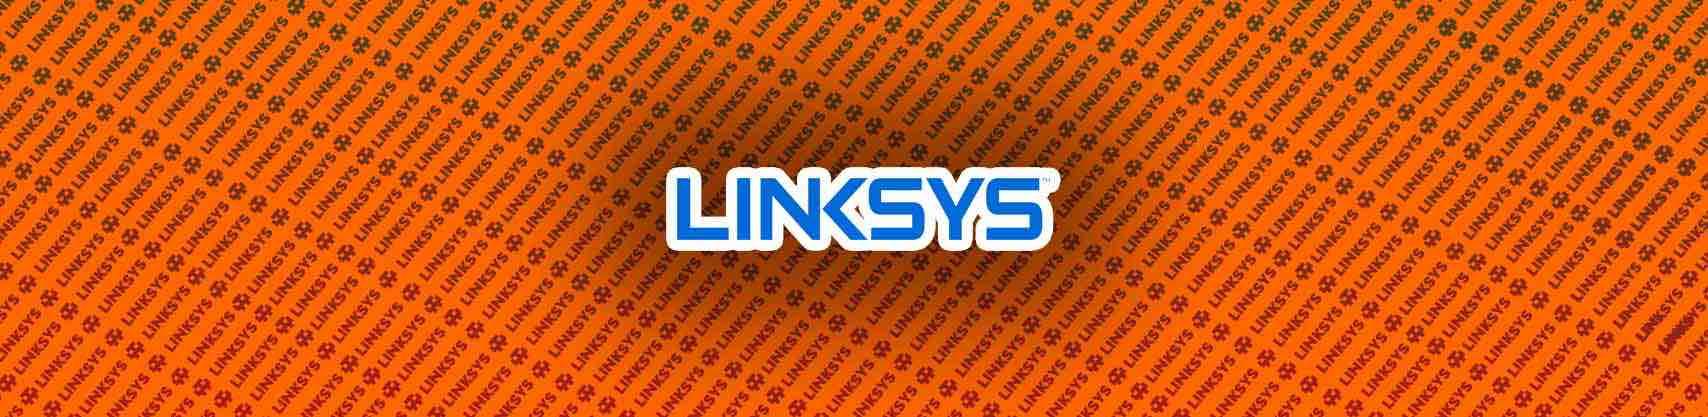 Linksys E900 Manual